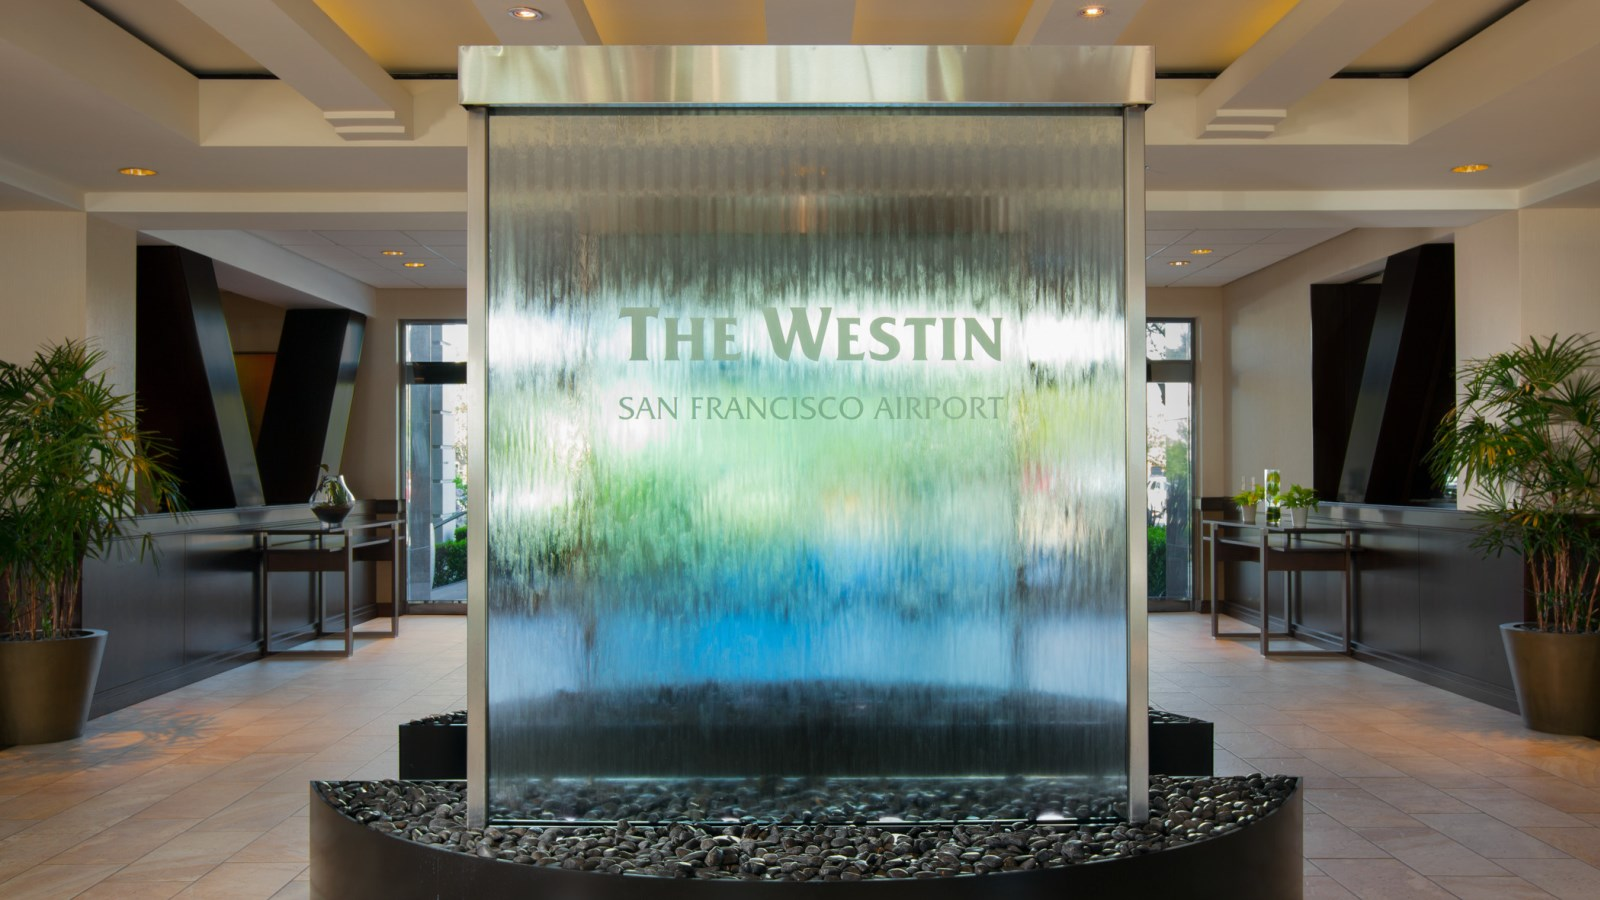 wes1007de-173765-Lobby-Waterfall-Fountain.jpg